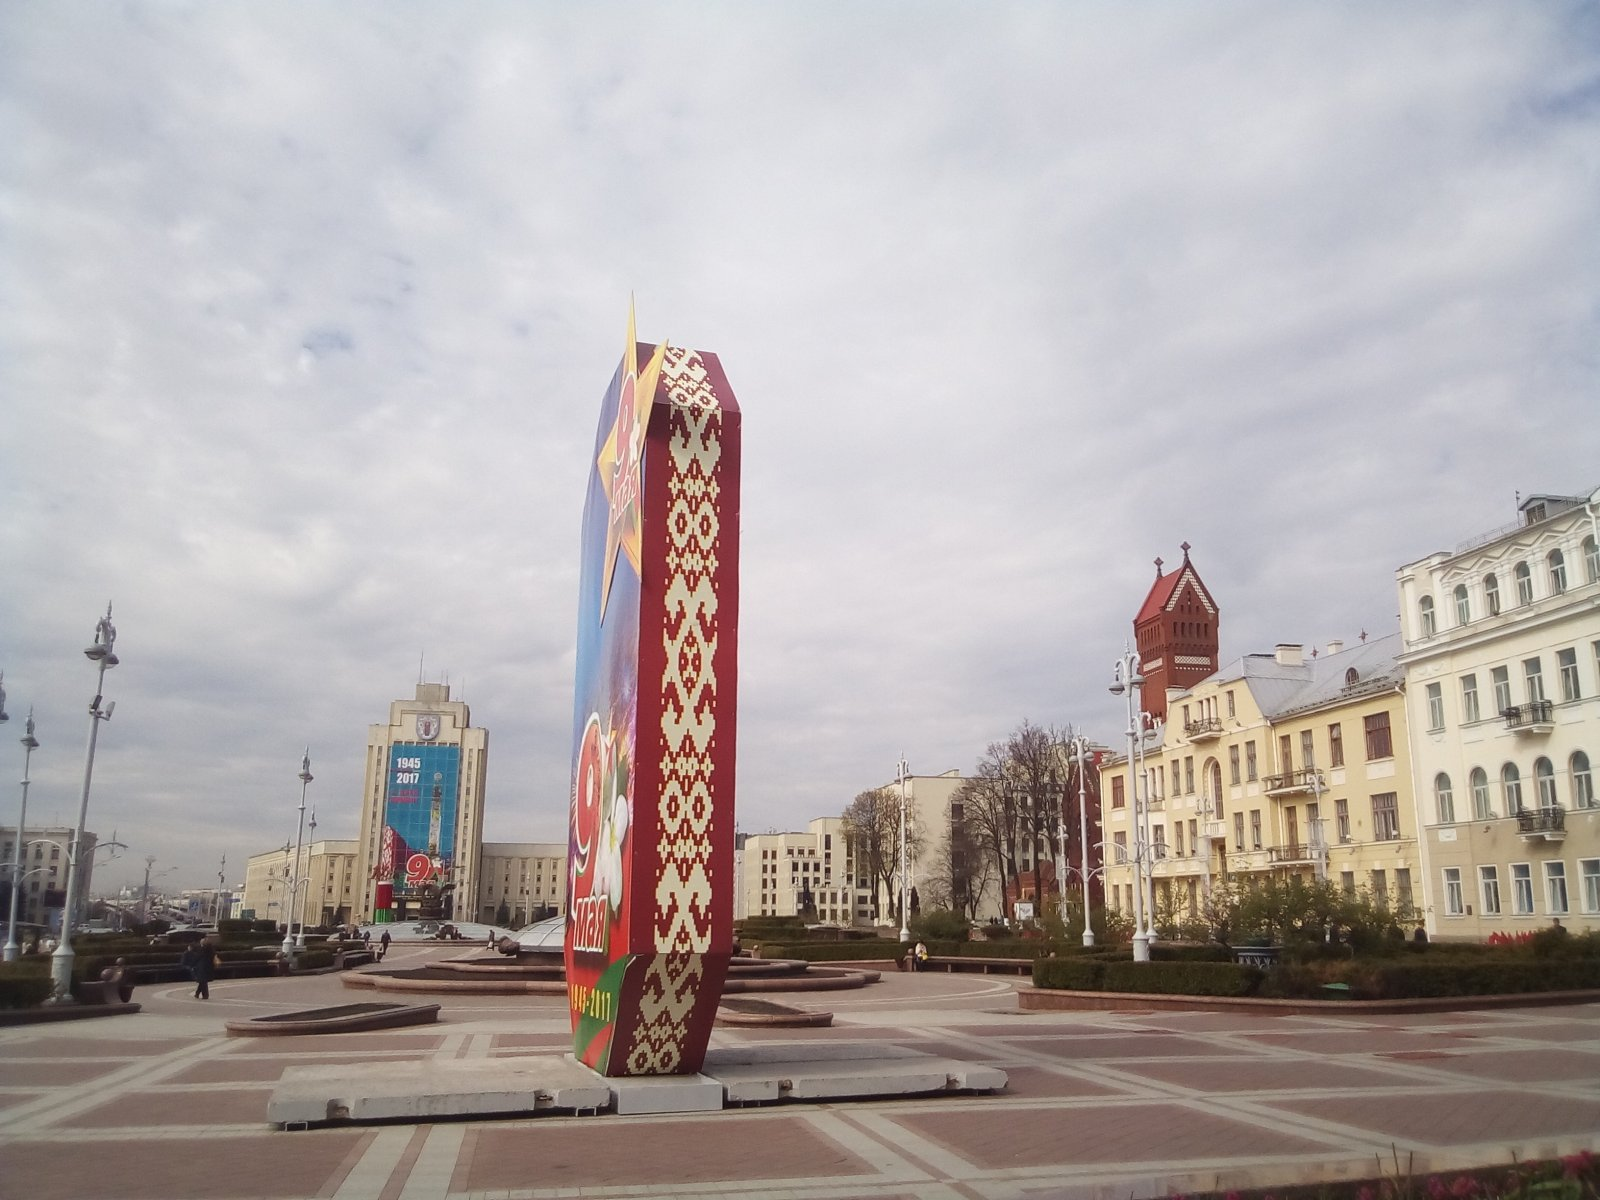 Минск — столица Республики Беларусь